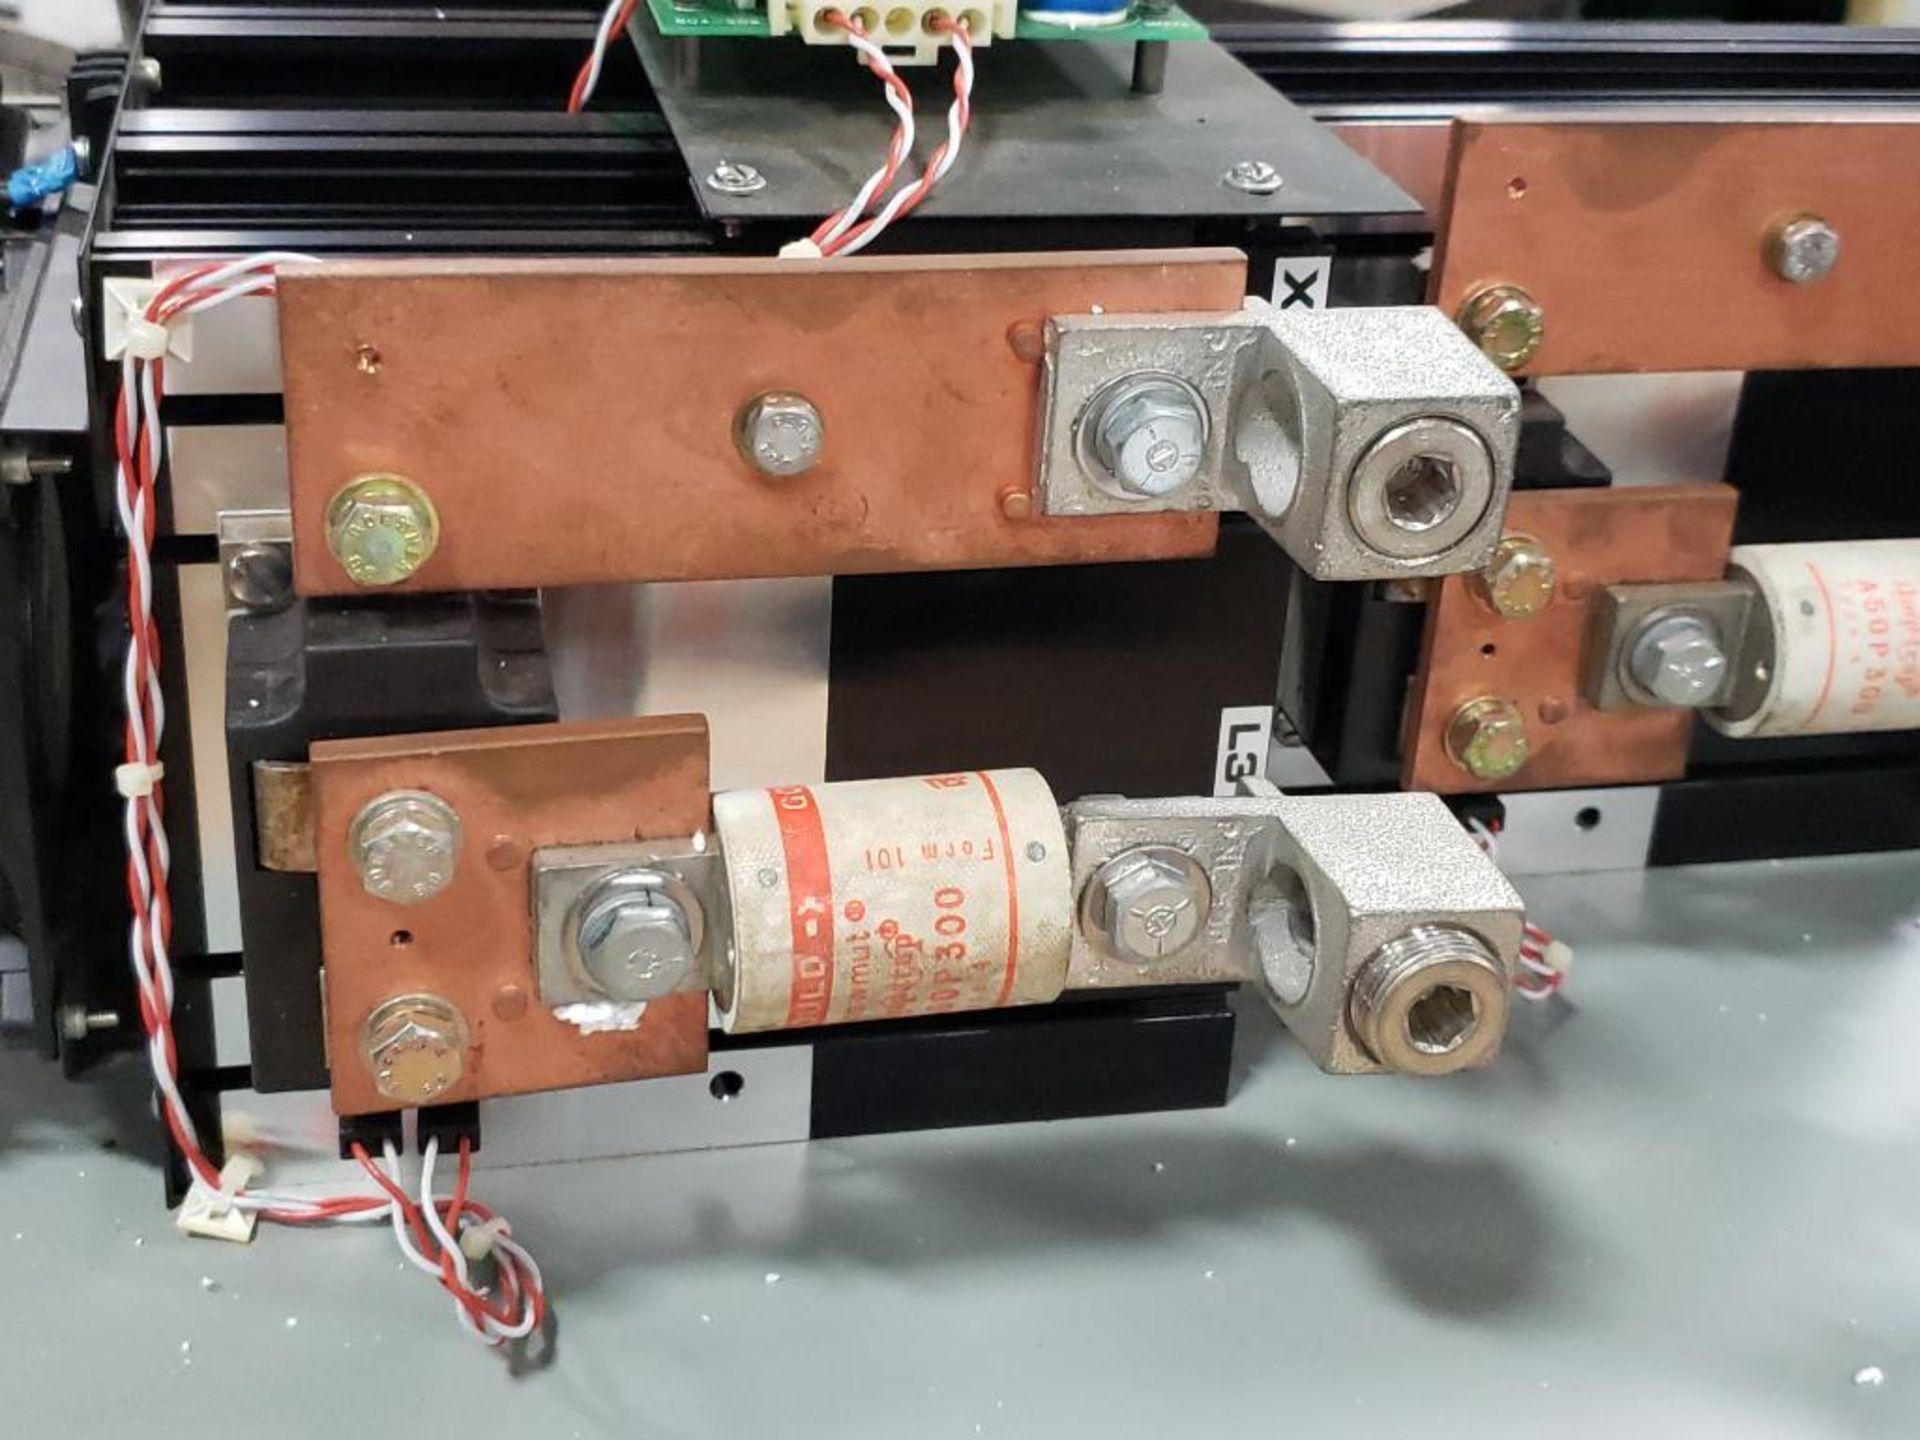 Chromalox 7830-309520-0400 power pak controller. - Image 6 of 10